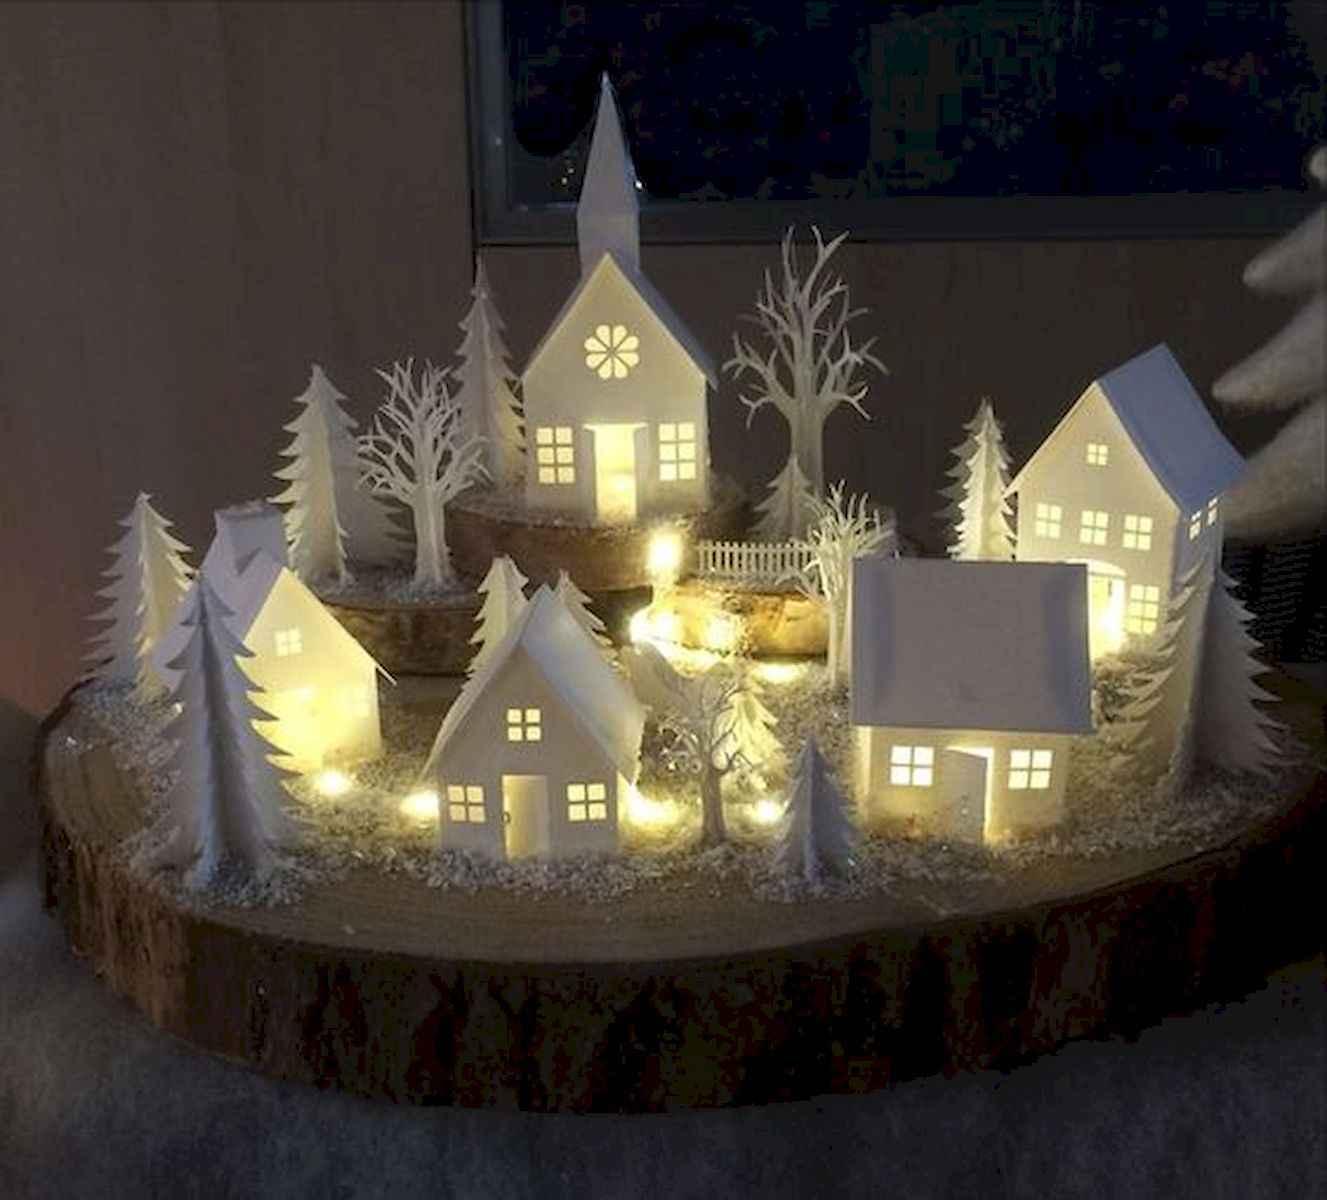 50 diy christmas decorations ideas (24)